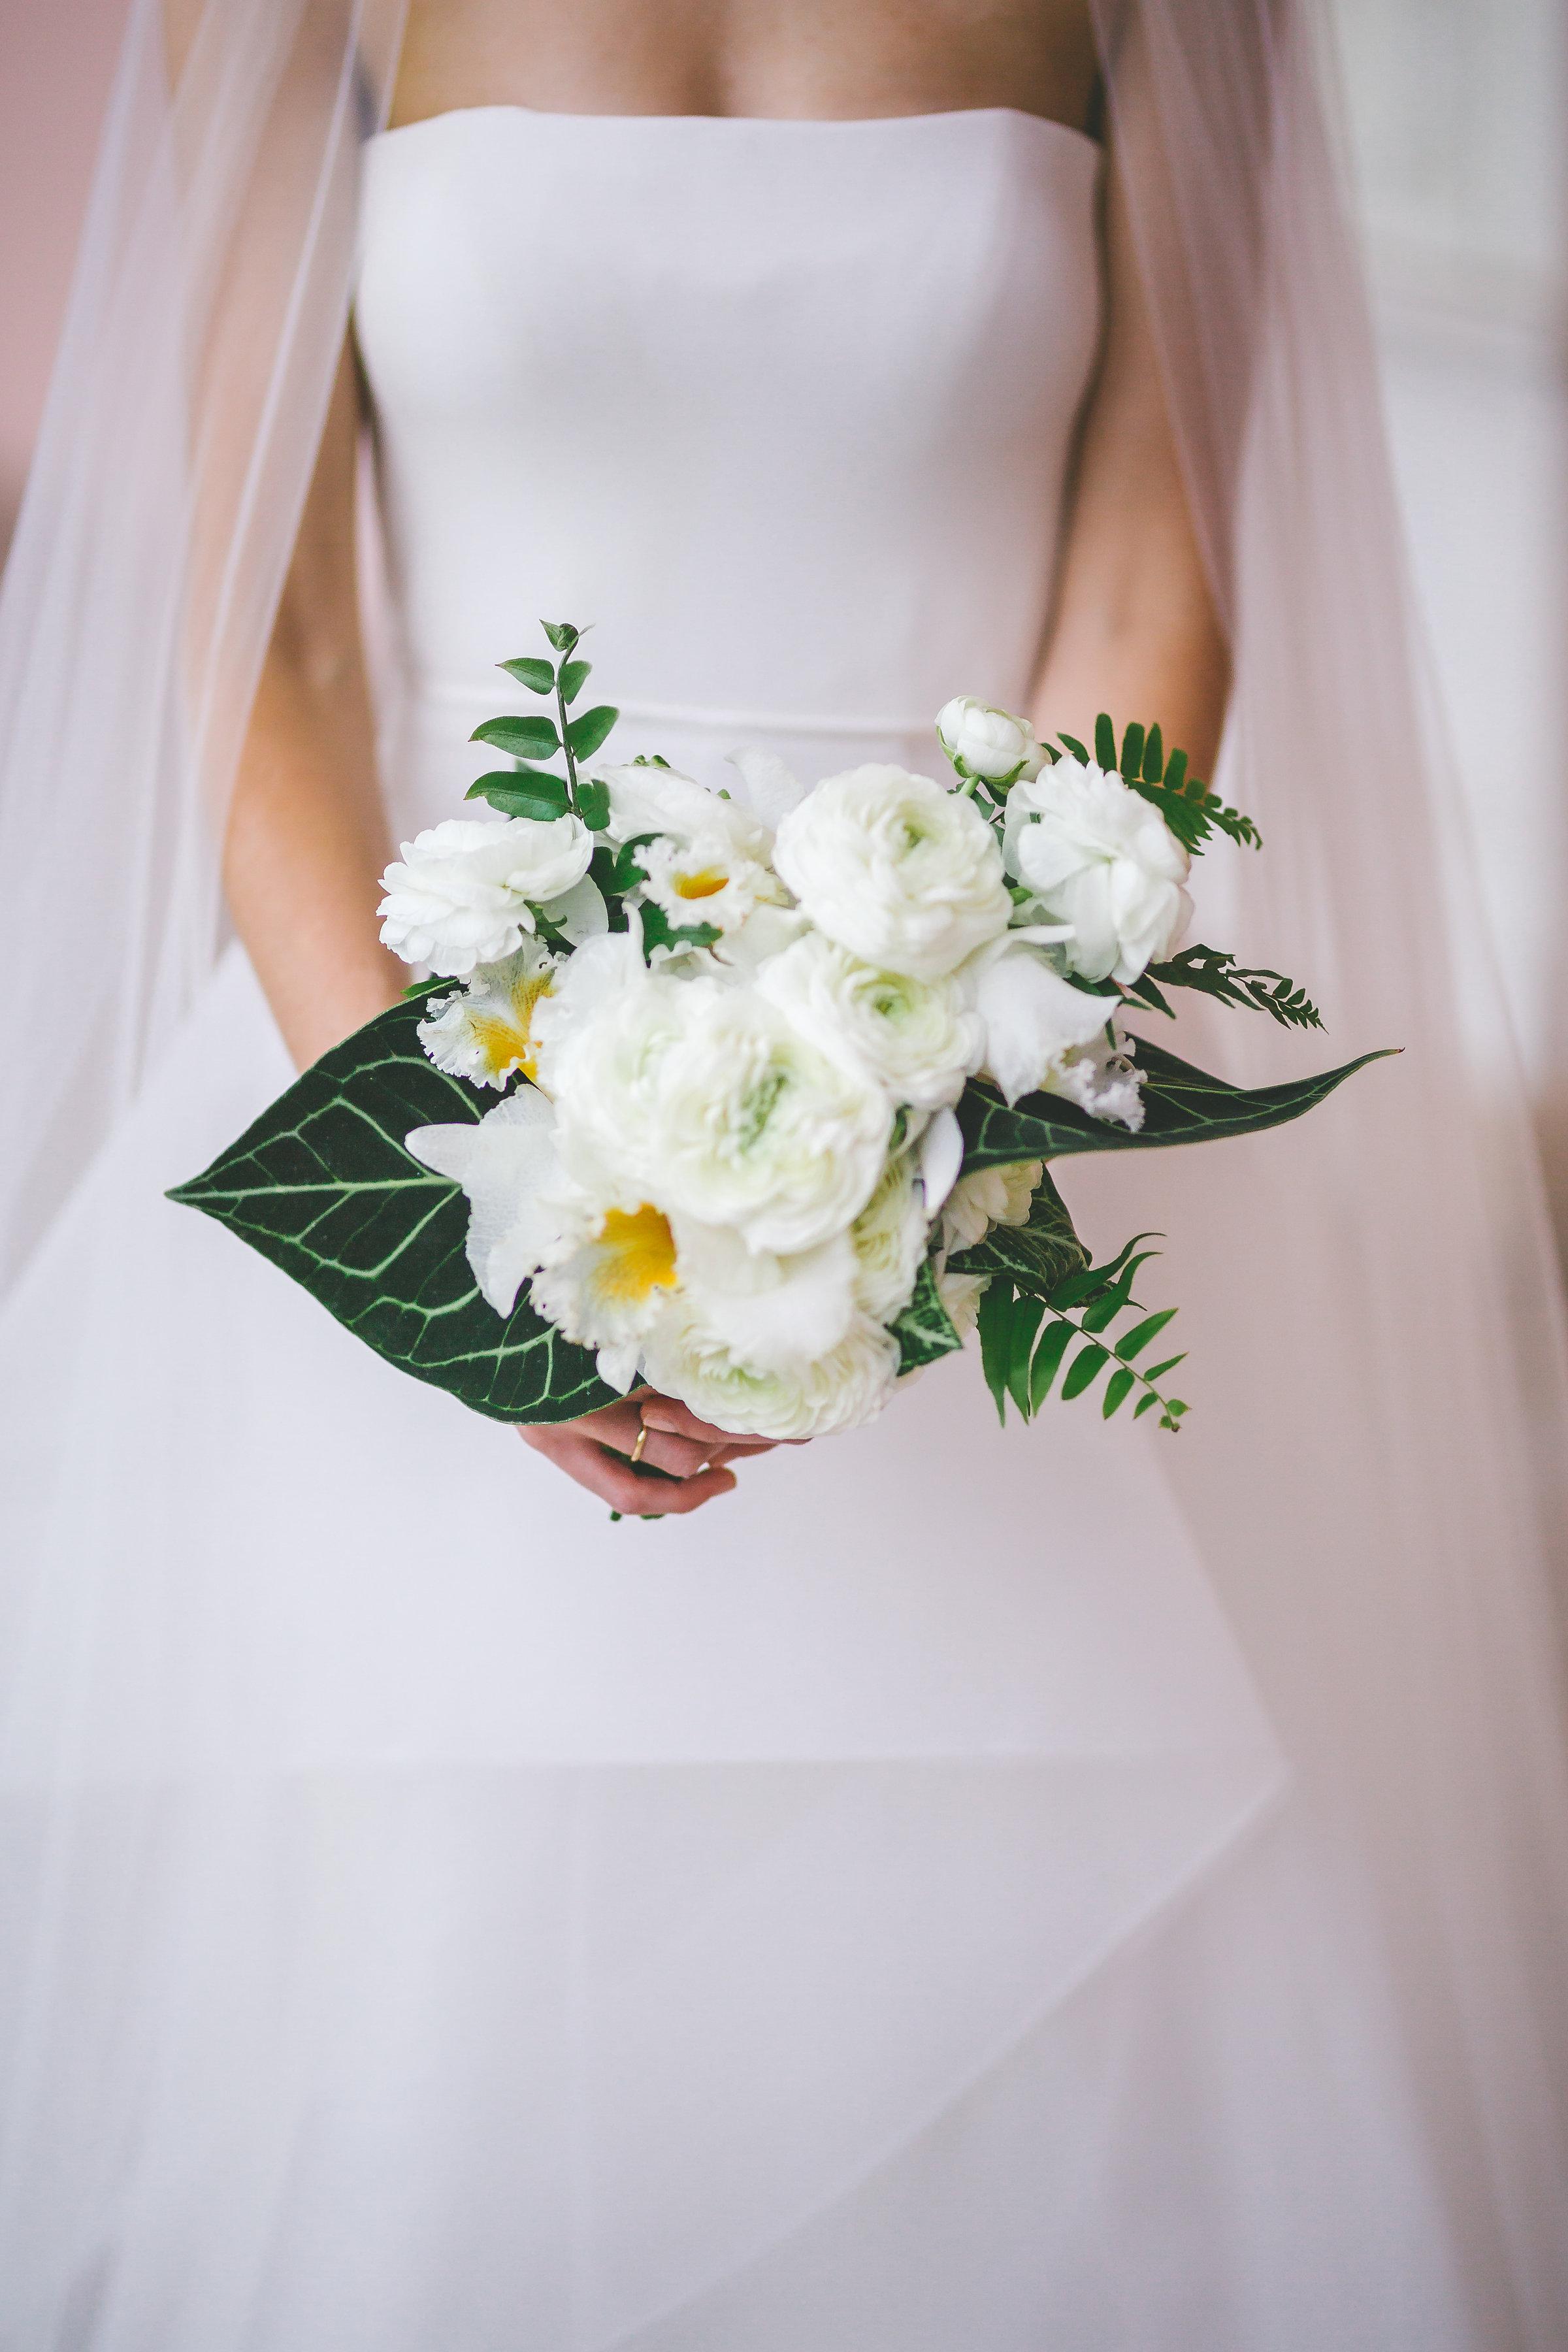 HighlightStudios-WeddingPhotographer-CourtneyandRob-735.jpg